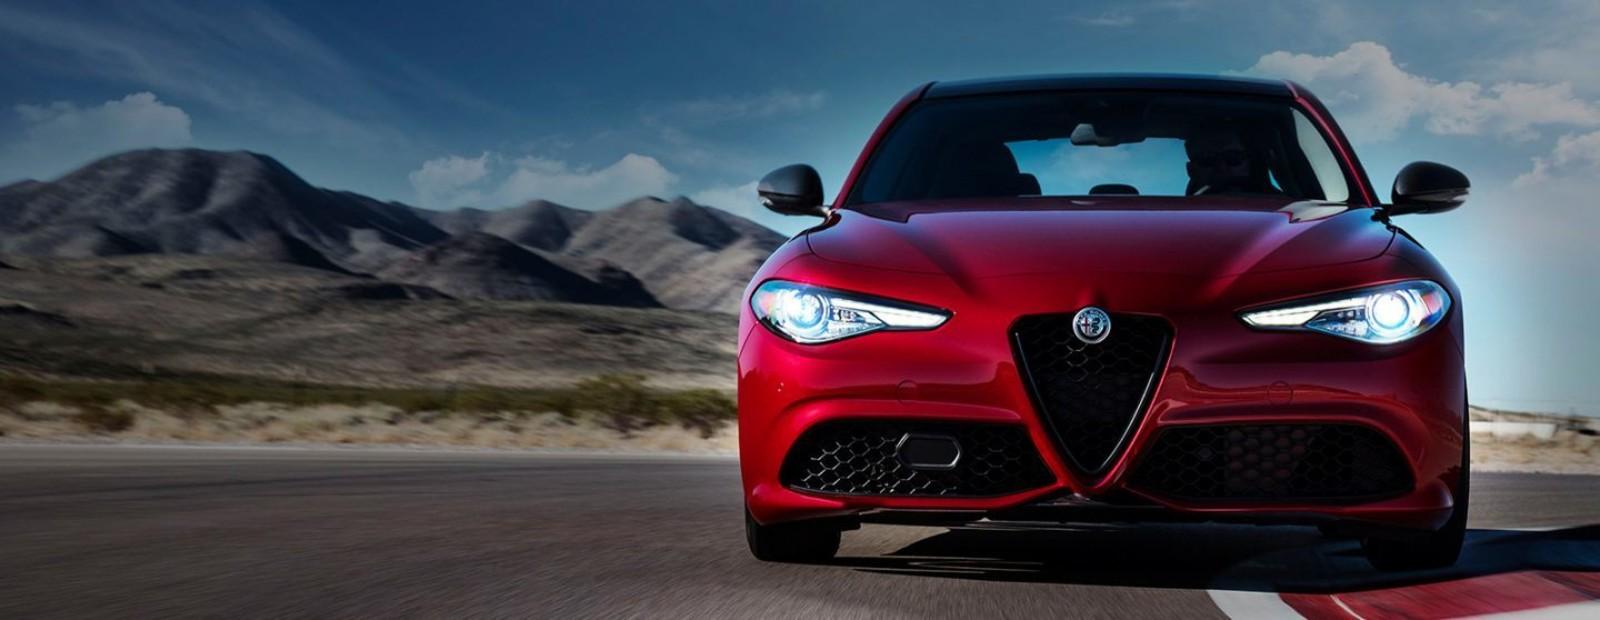 2019 Alfa Romeo Giulia - A Luxurious World Class Sports Sedan